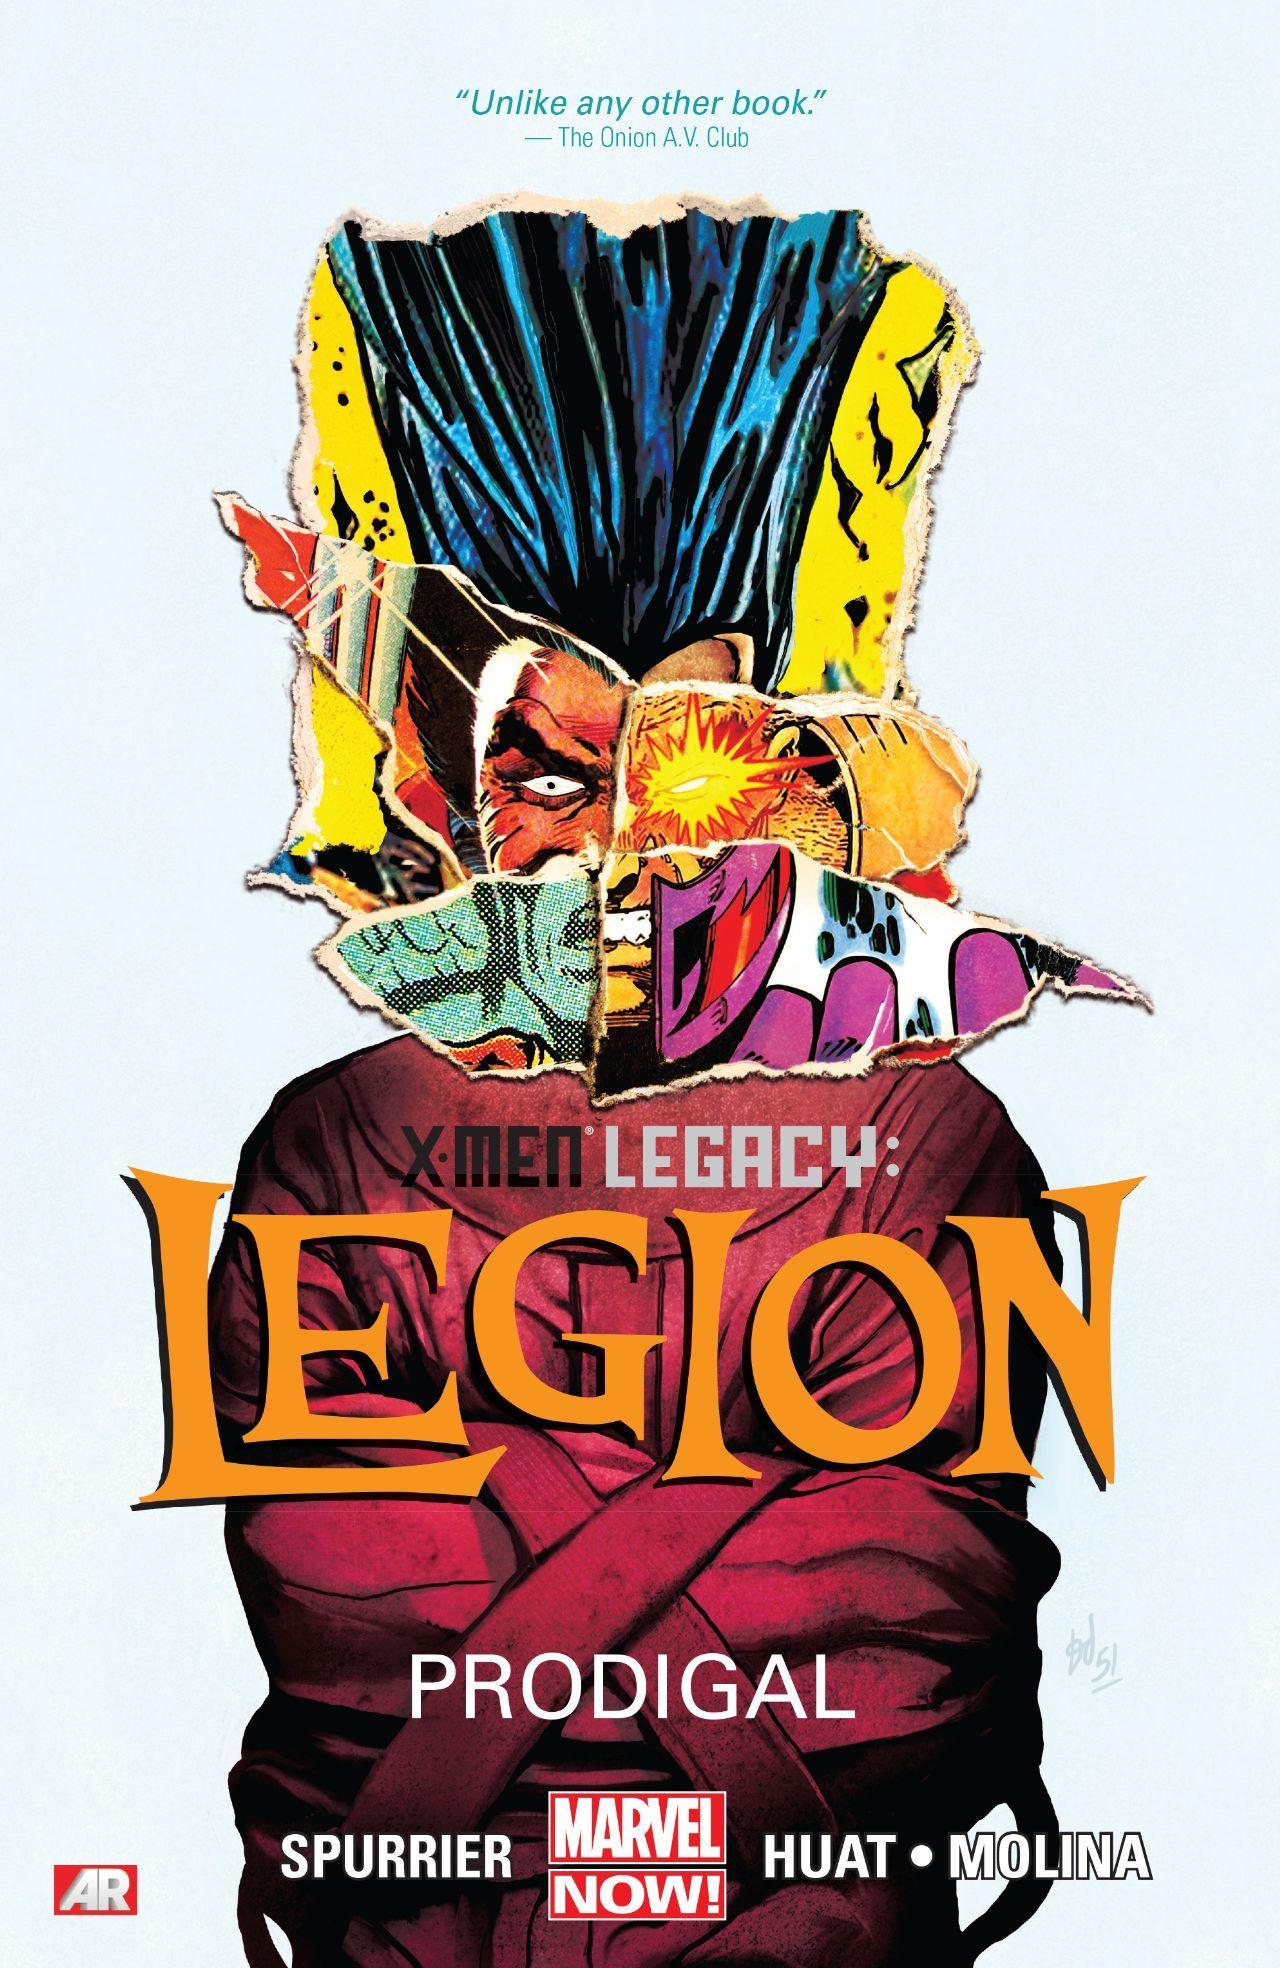 X Men Legacy Legion Vol 1 Prodigal Legion Comic Marvel Legion Marvel Now